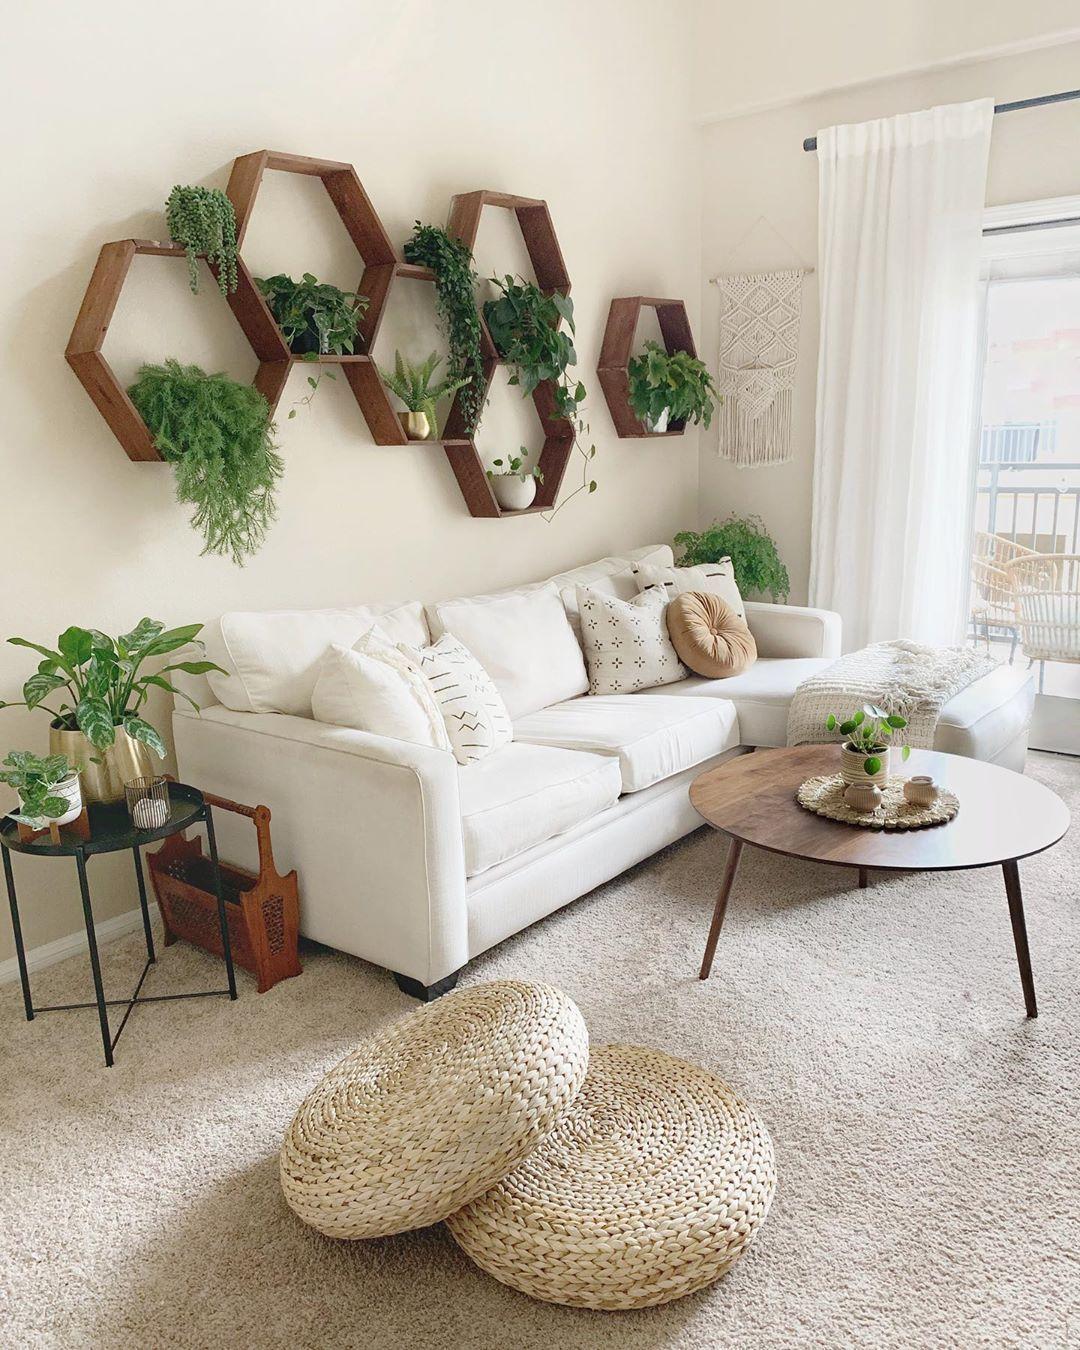 chic living room interior design to copy